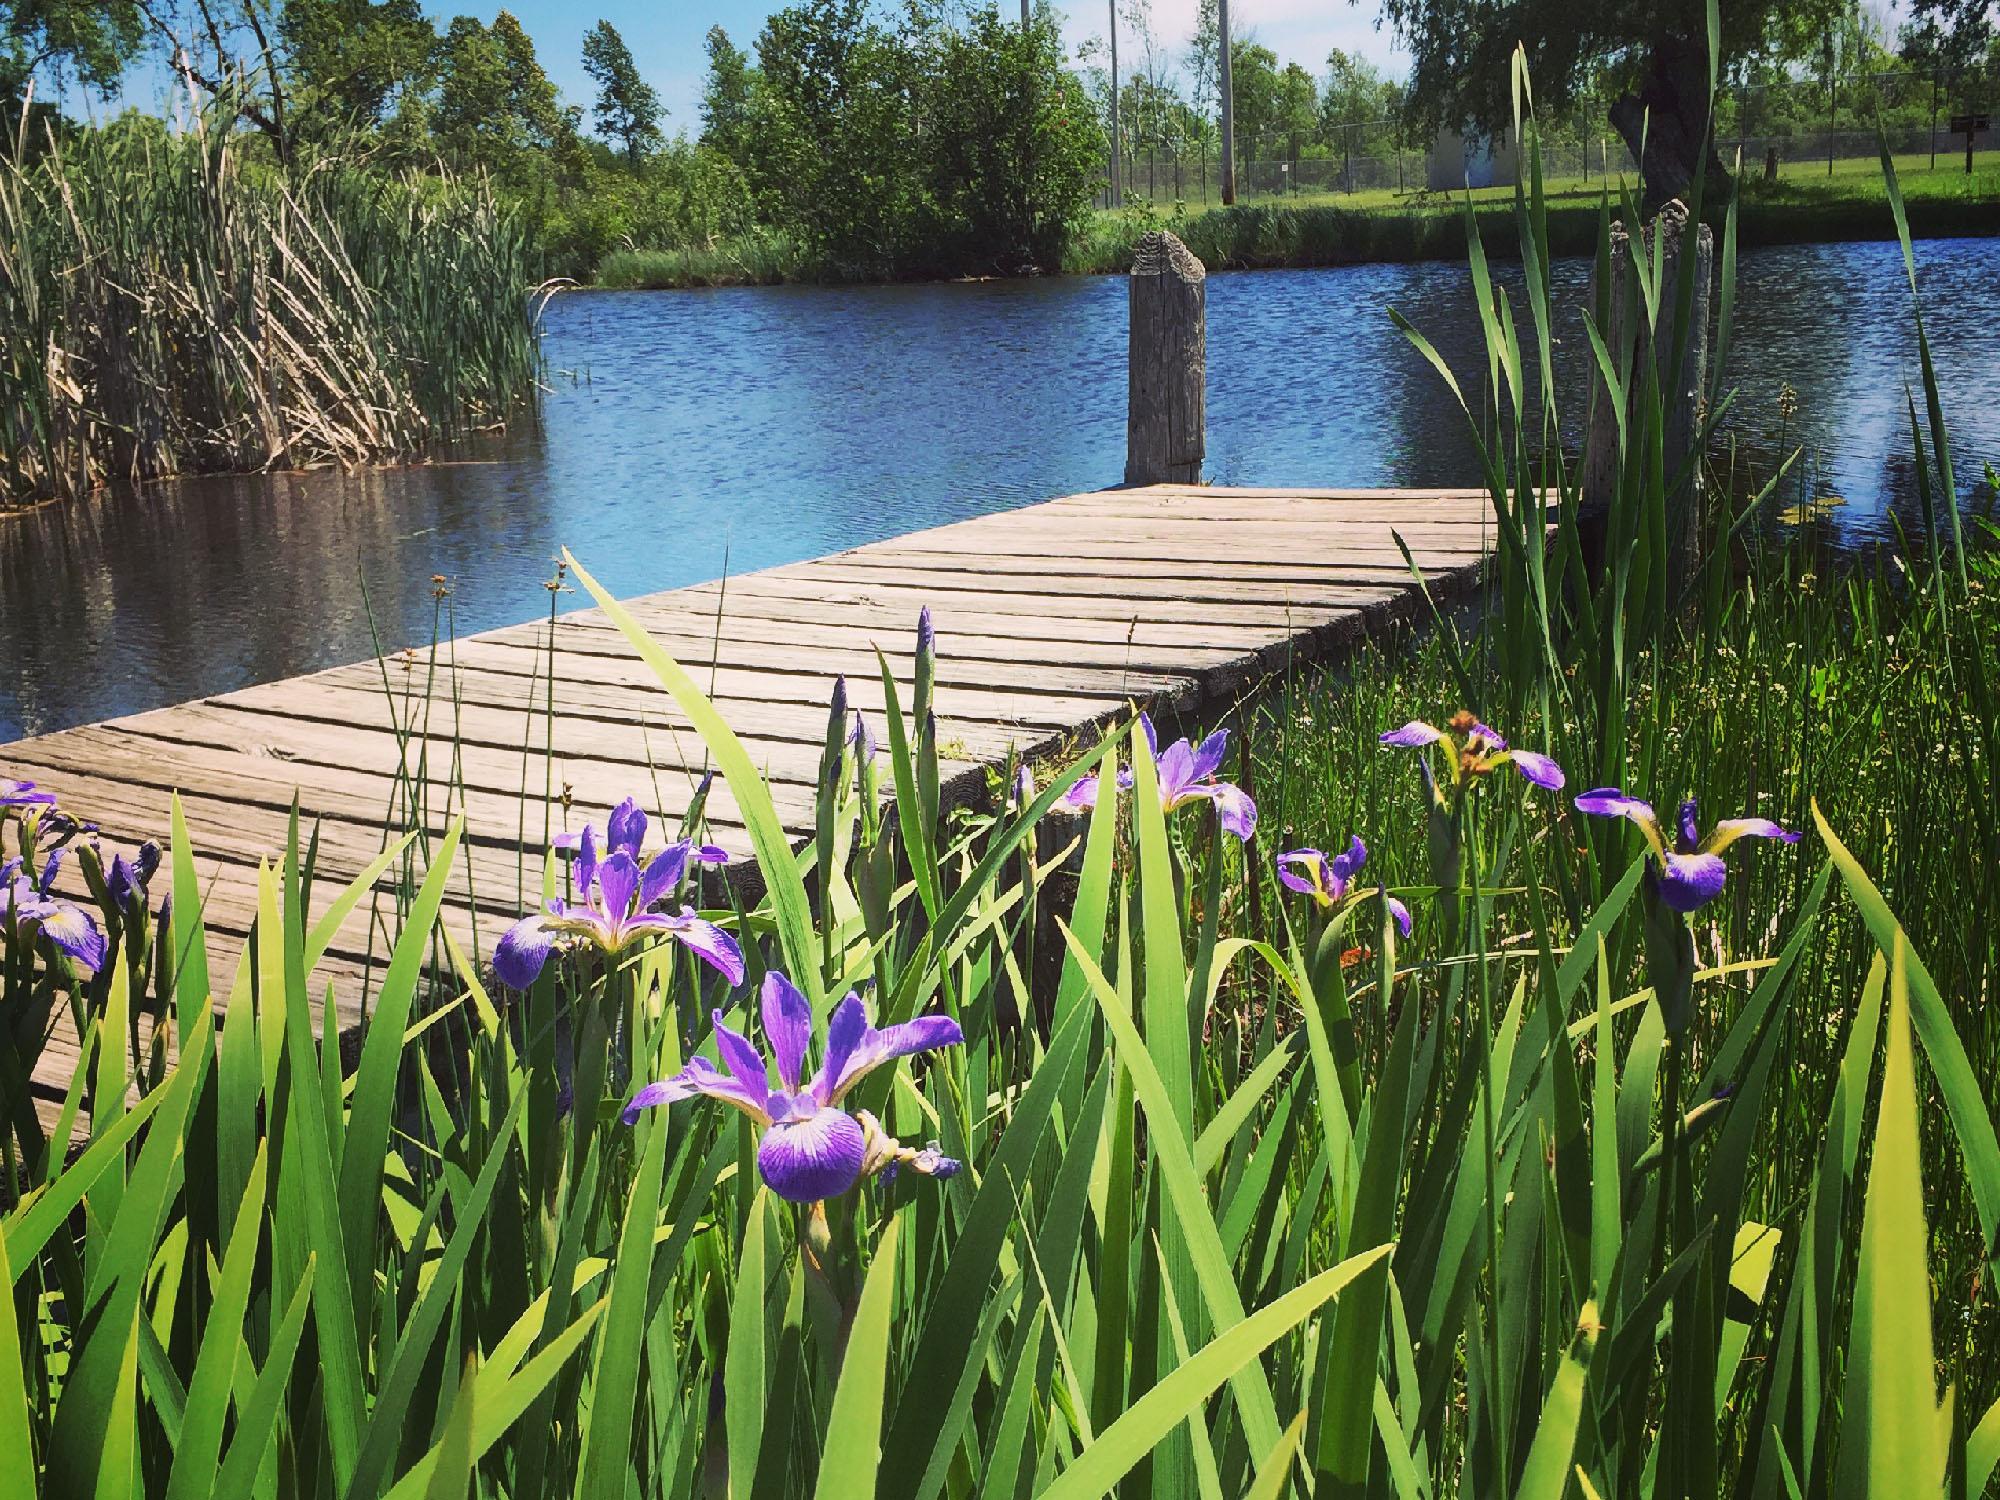 Cedar River Marina Park